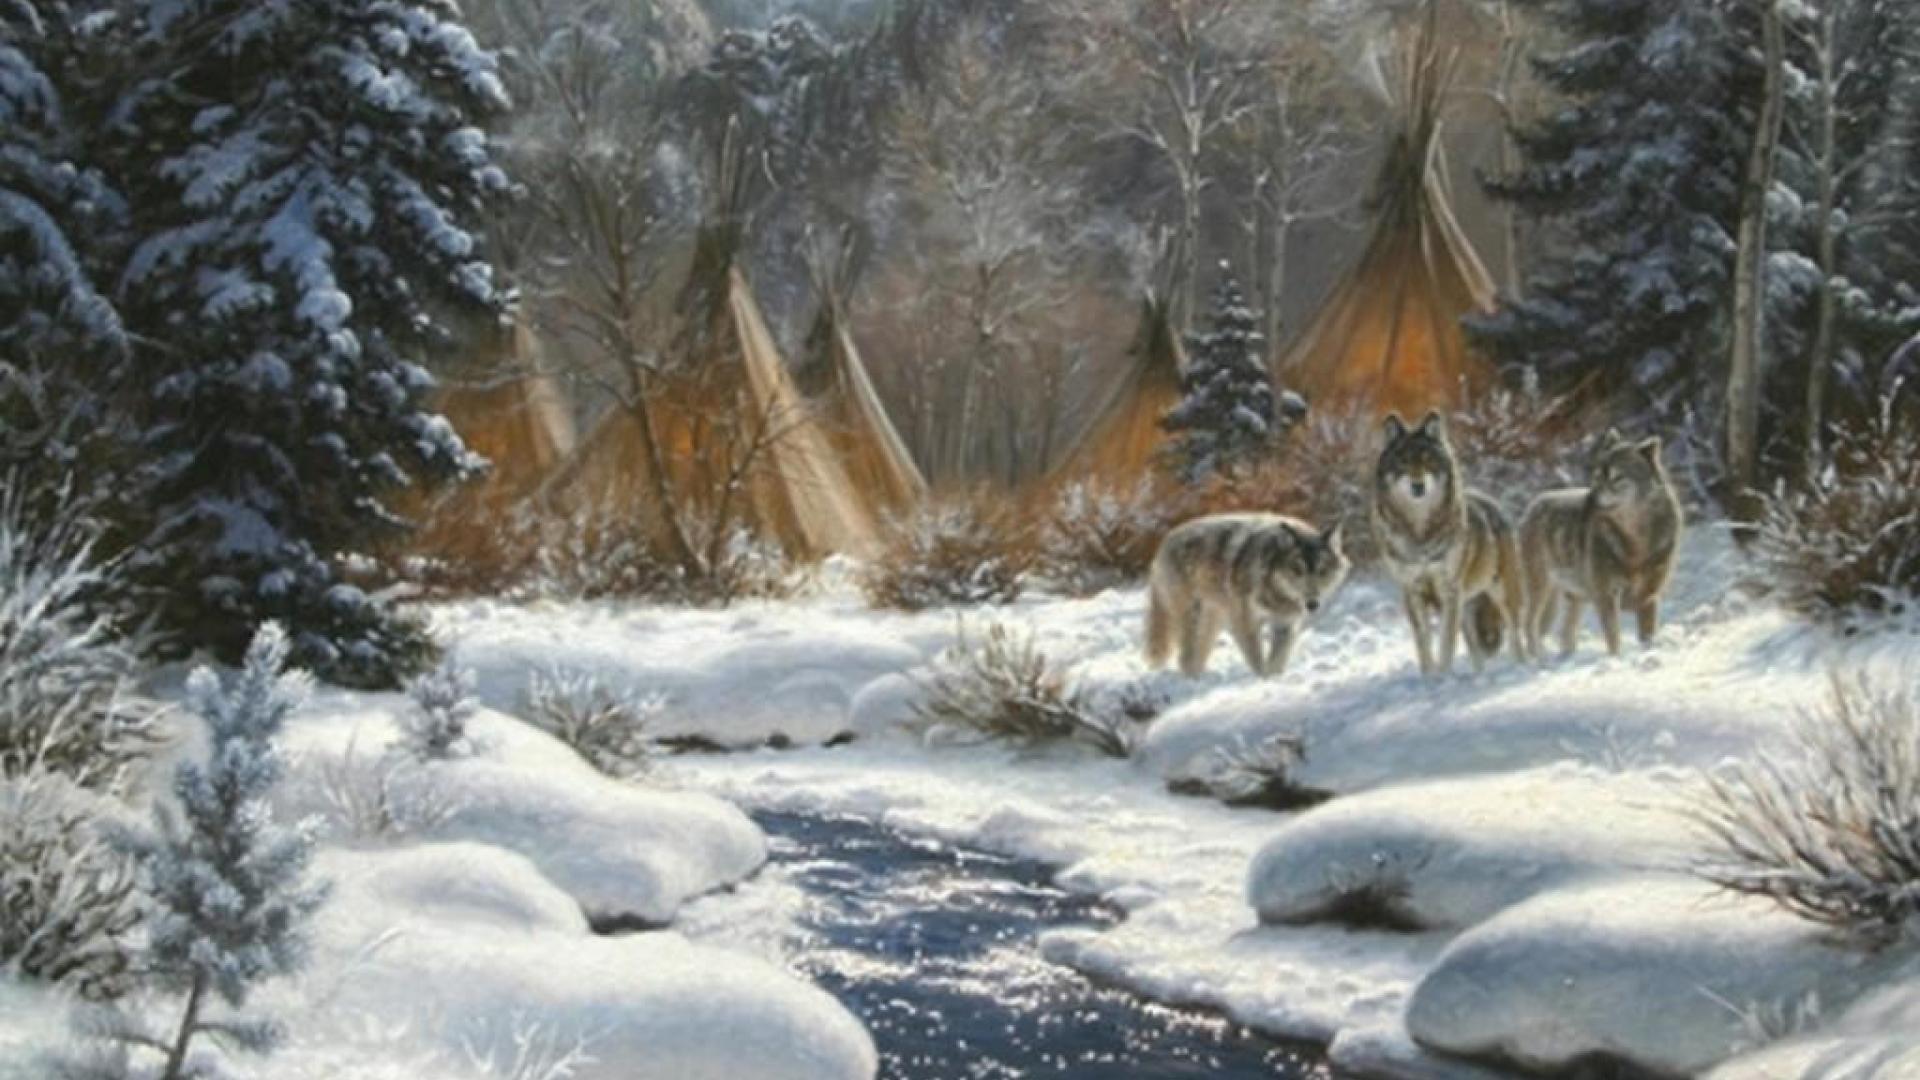 american winter camp wallpaper   77157   HQ Desktop Wallpapers 1920x1080